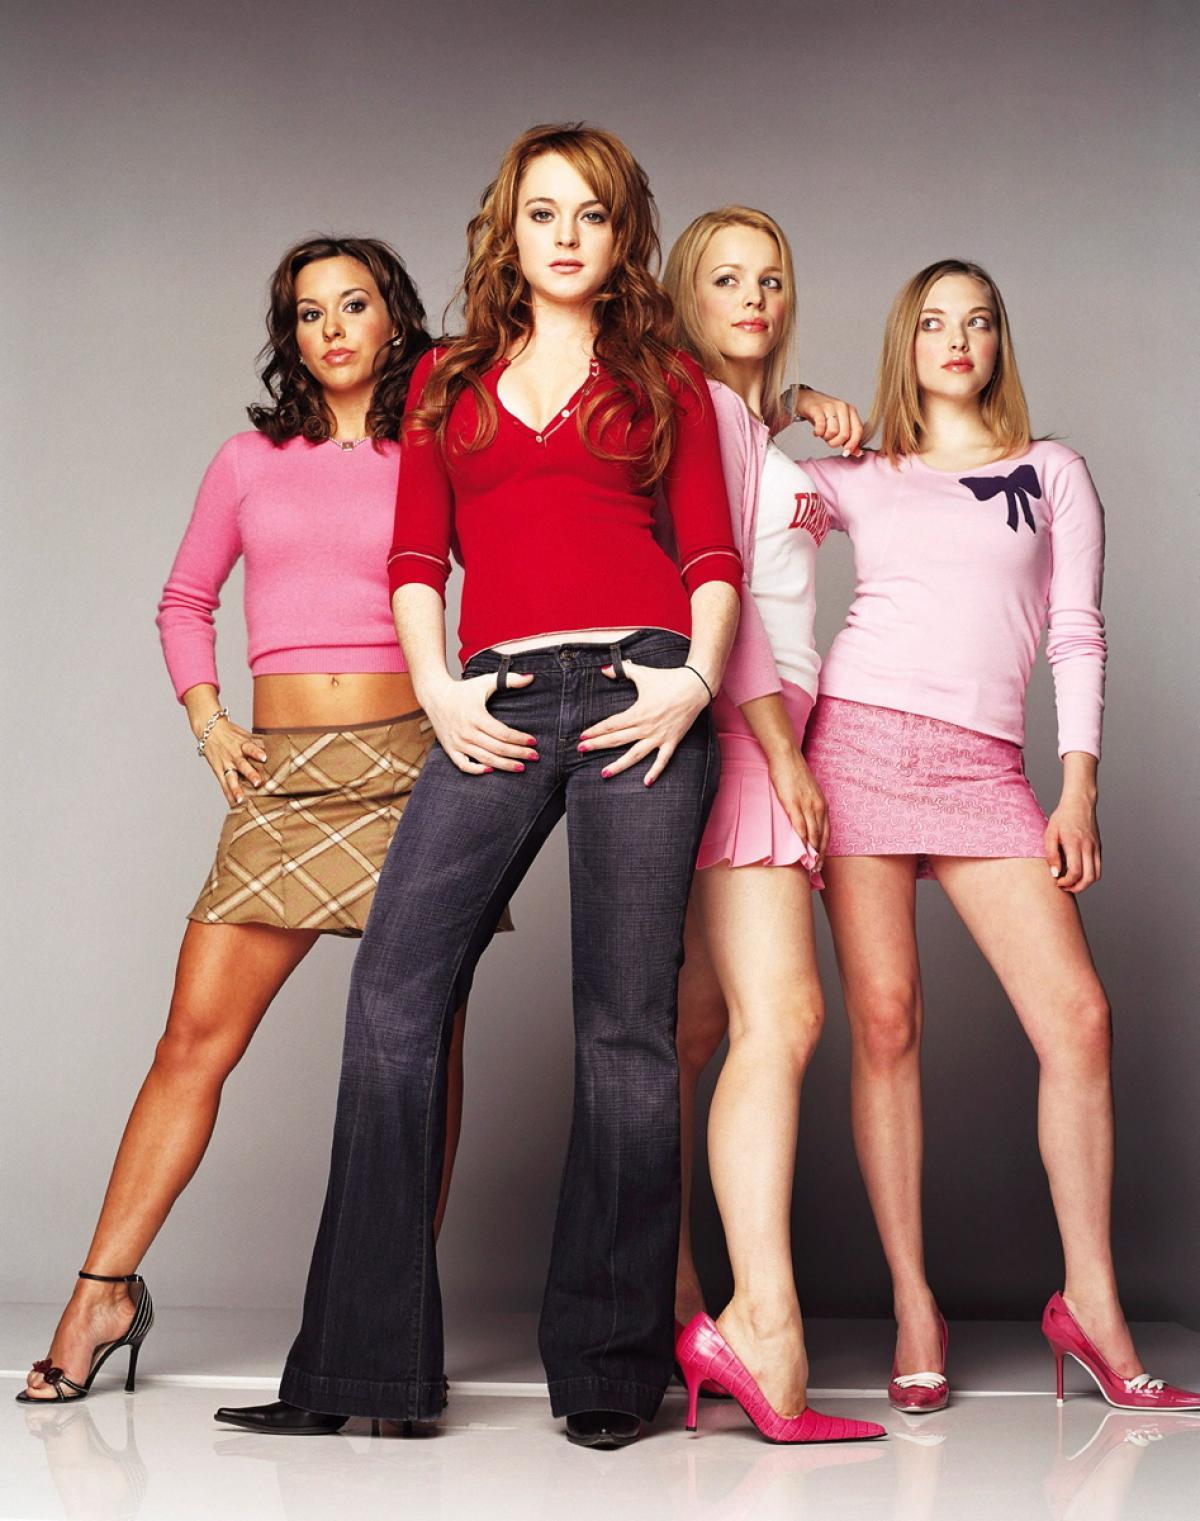 cast-girls-ten-years.jpg